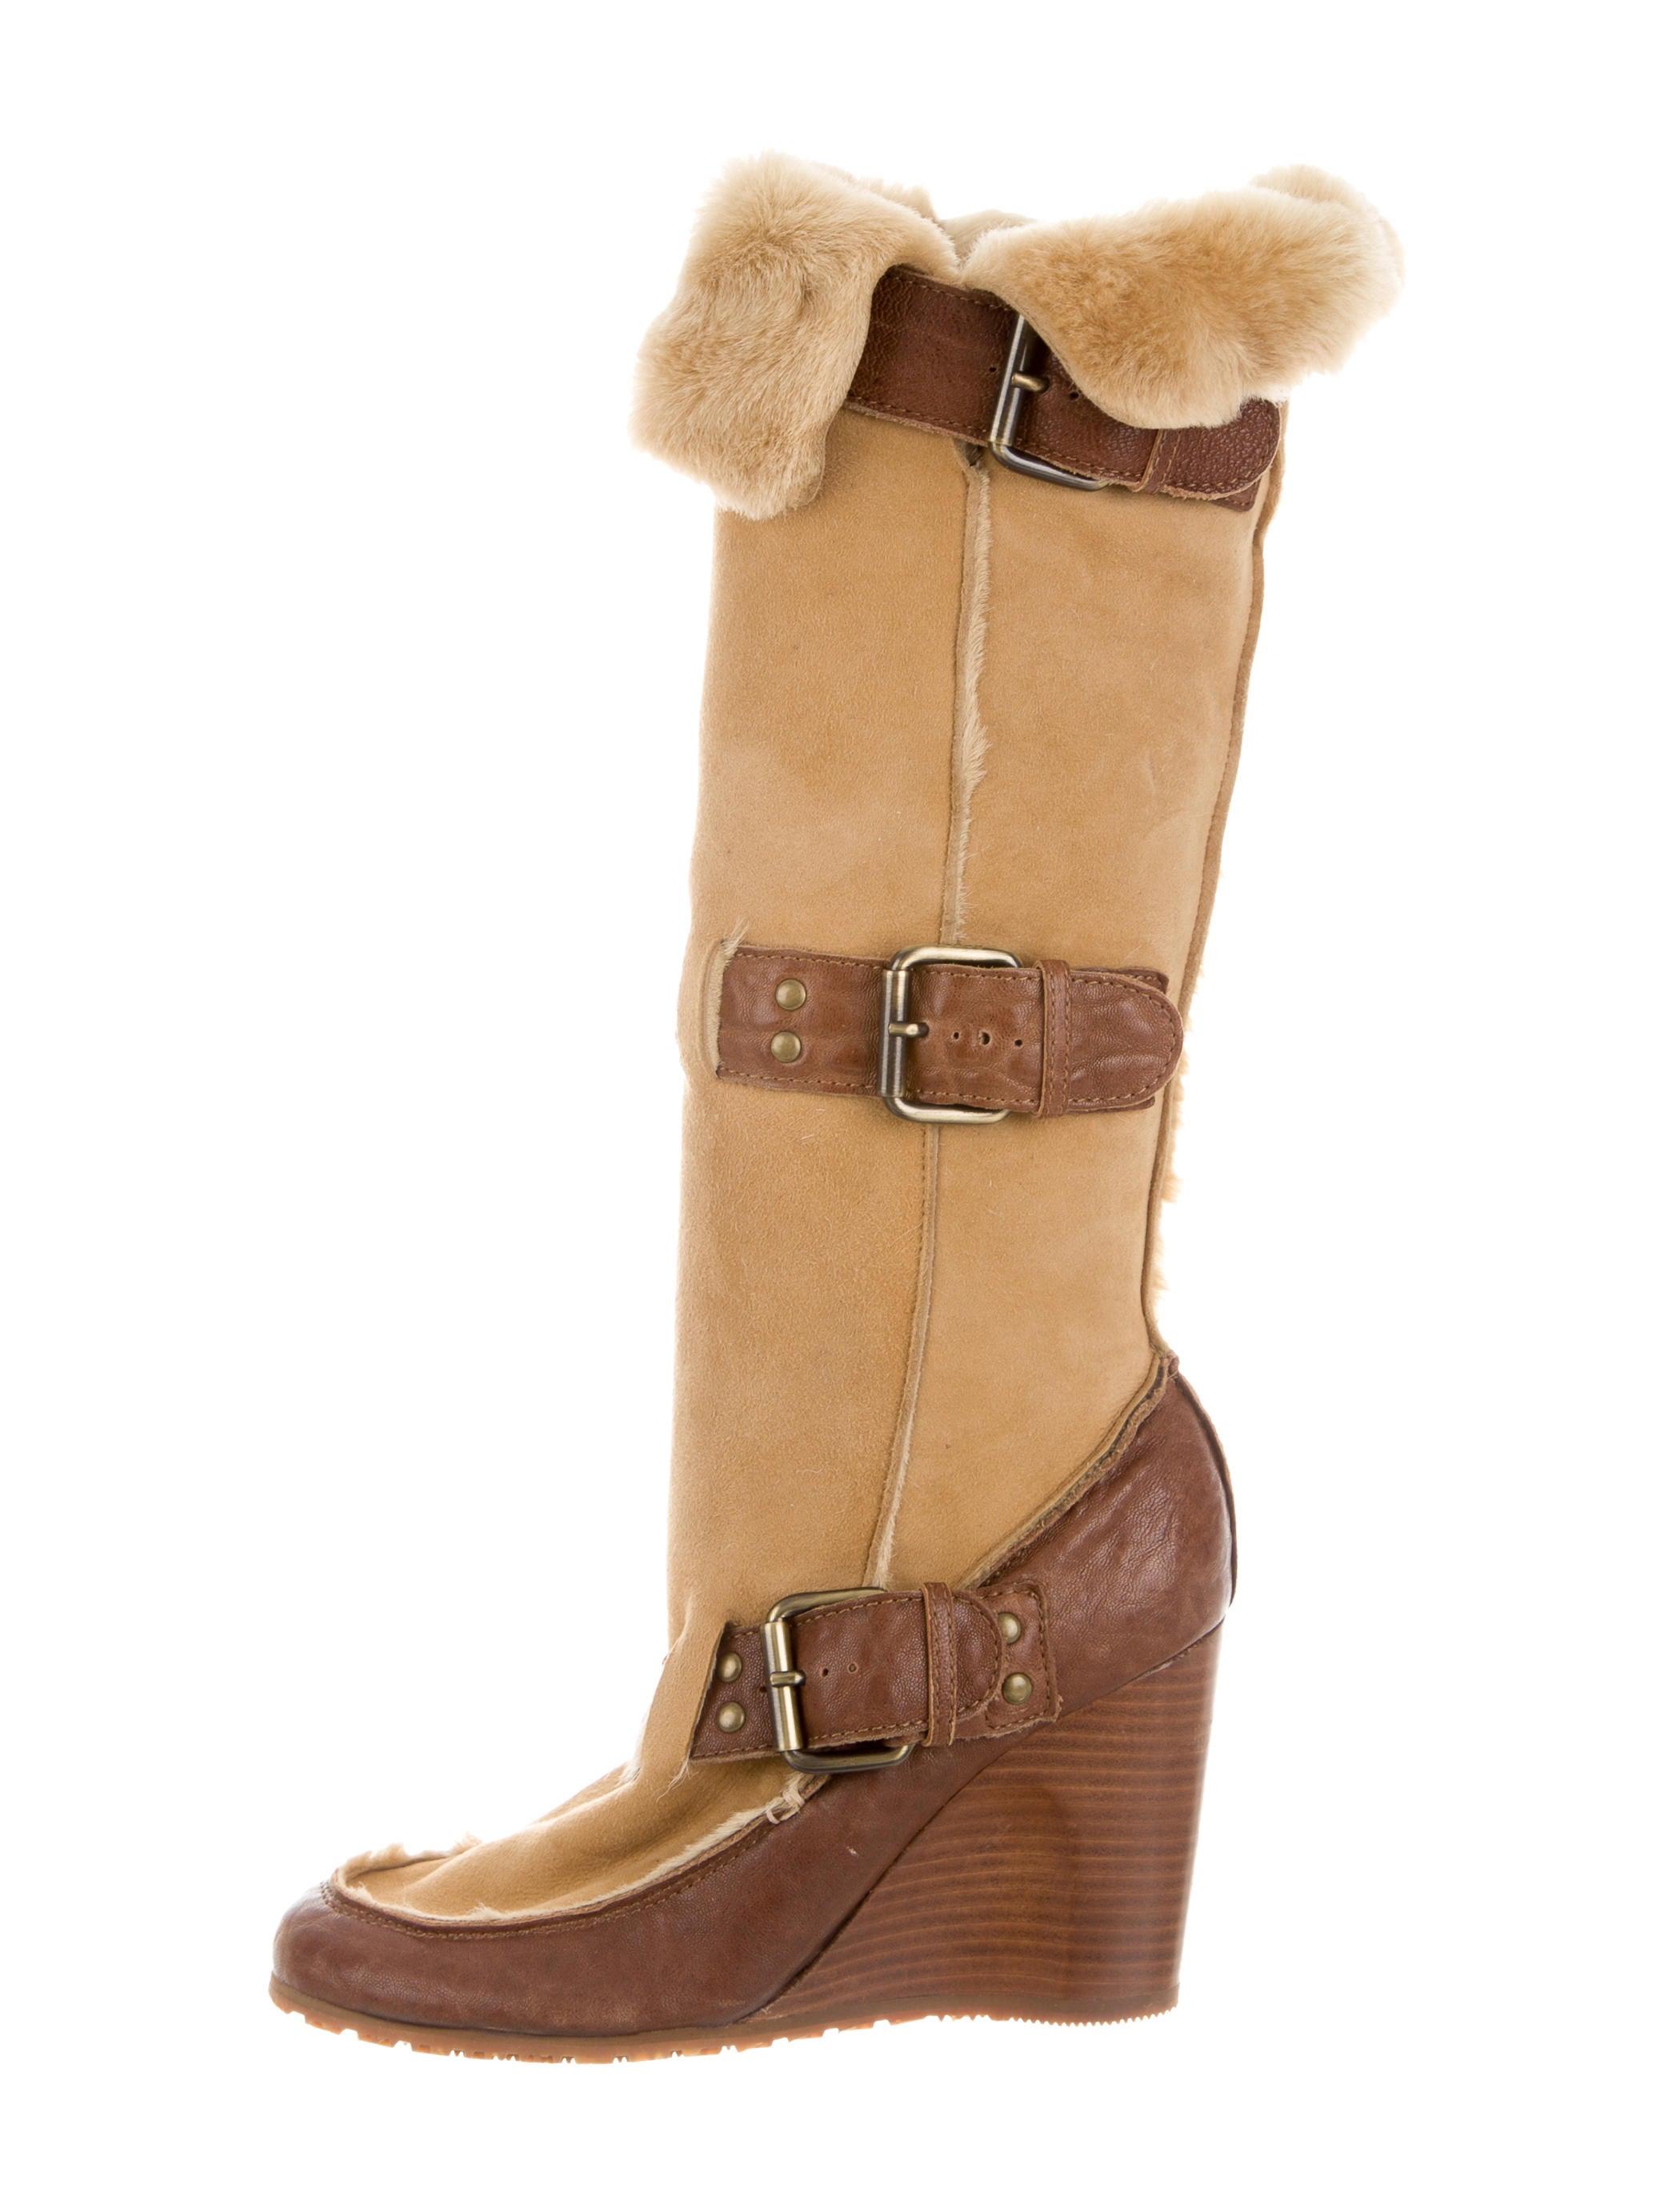 fendi fur trimmed knee high boots shoes fen43967 the